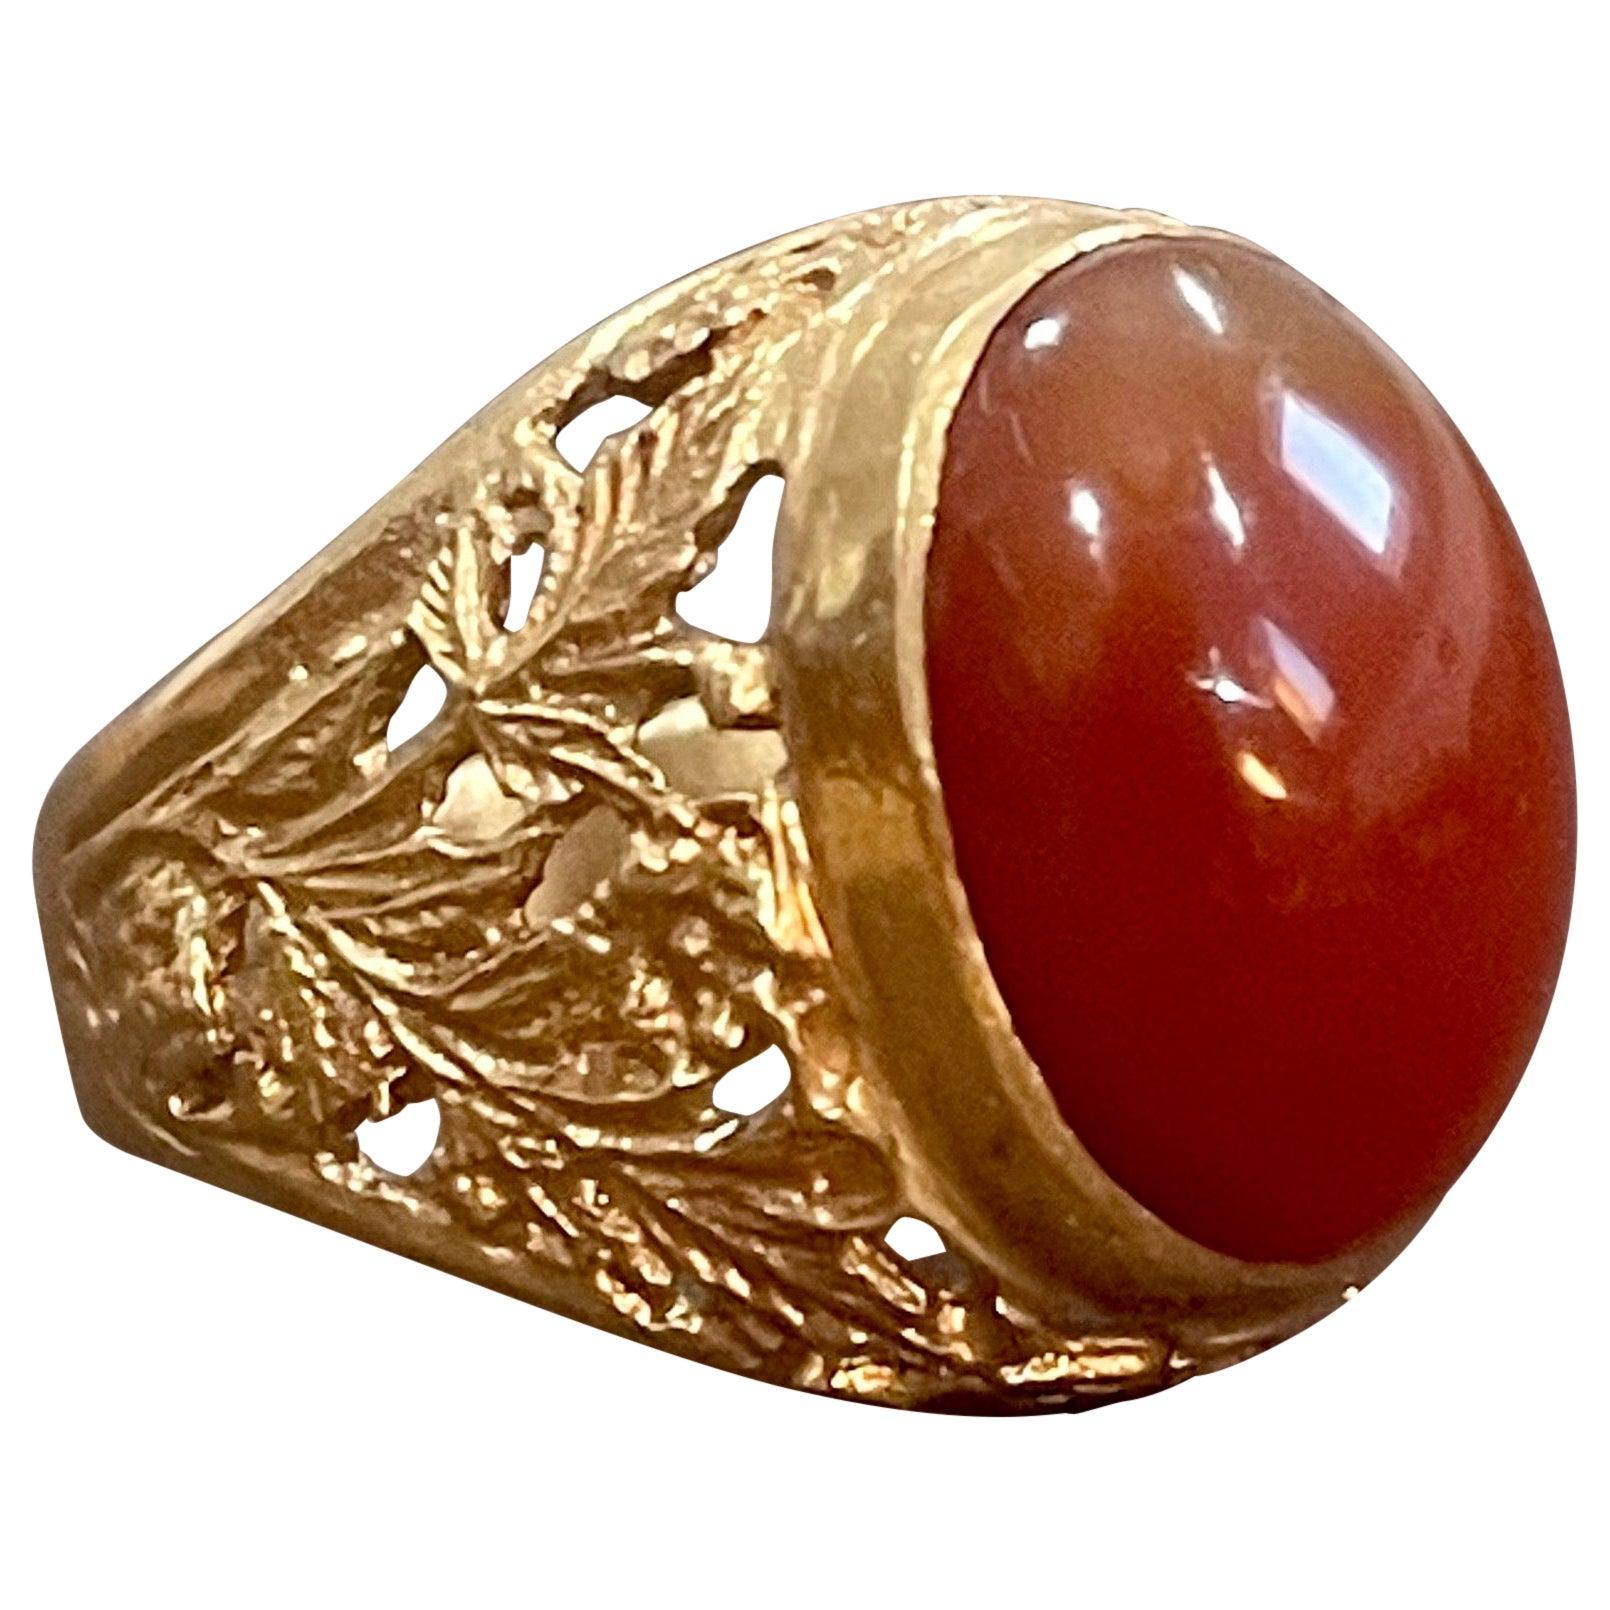 7 Carat Jasper Cabochon 18 Karat Yellow Gold Classic Wide Ring